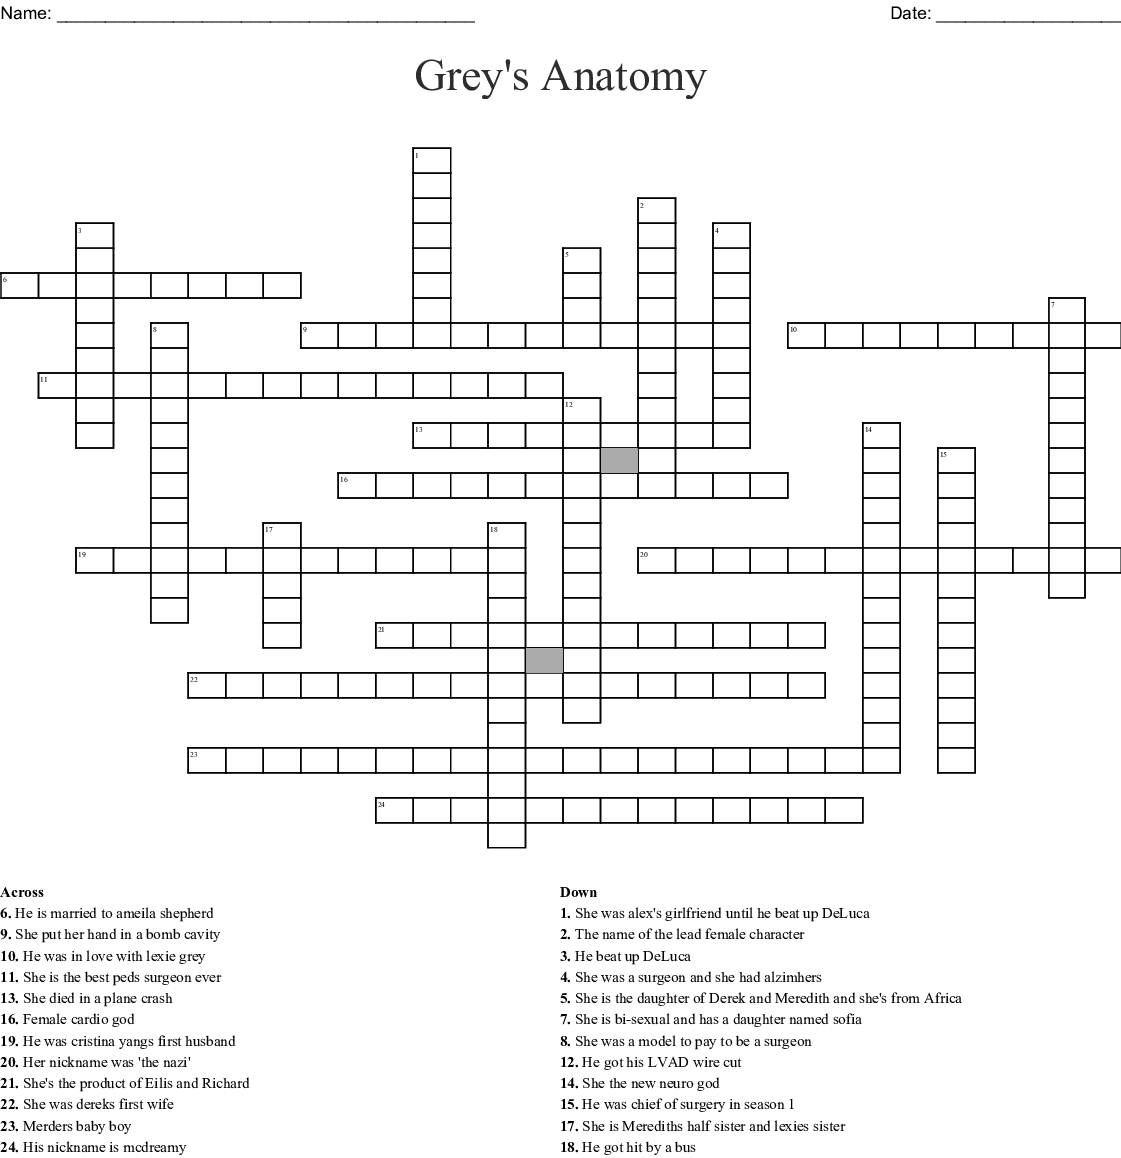 Grey's Anatomy Crossword - Wordmint - Printable Grey's Anatomy Crossword Puzzles